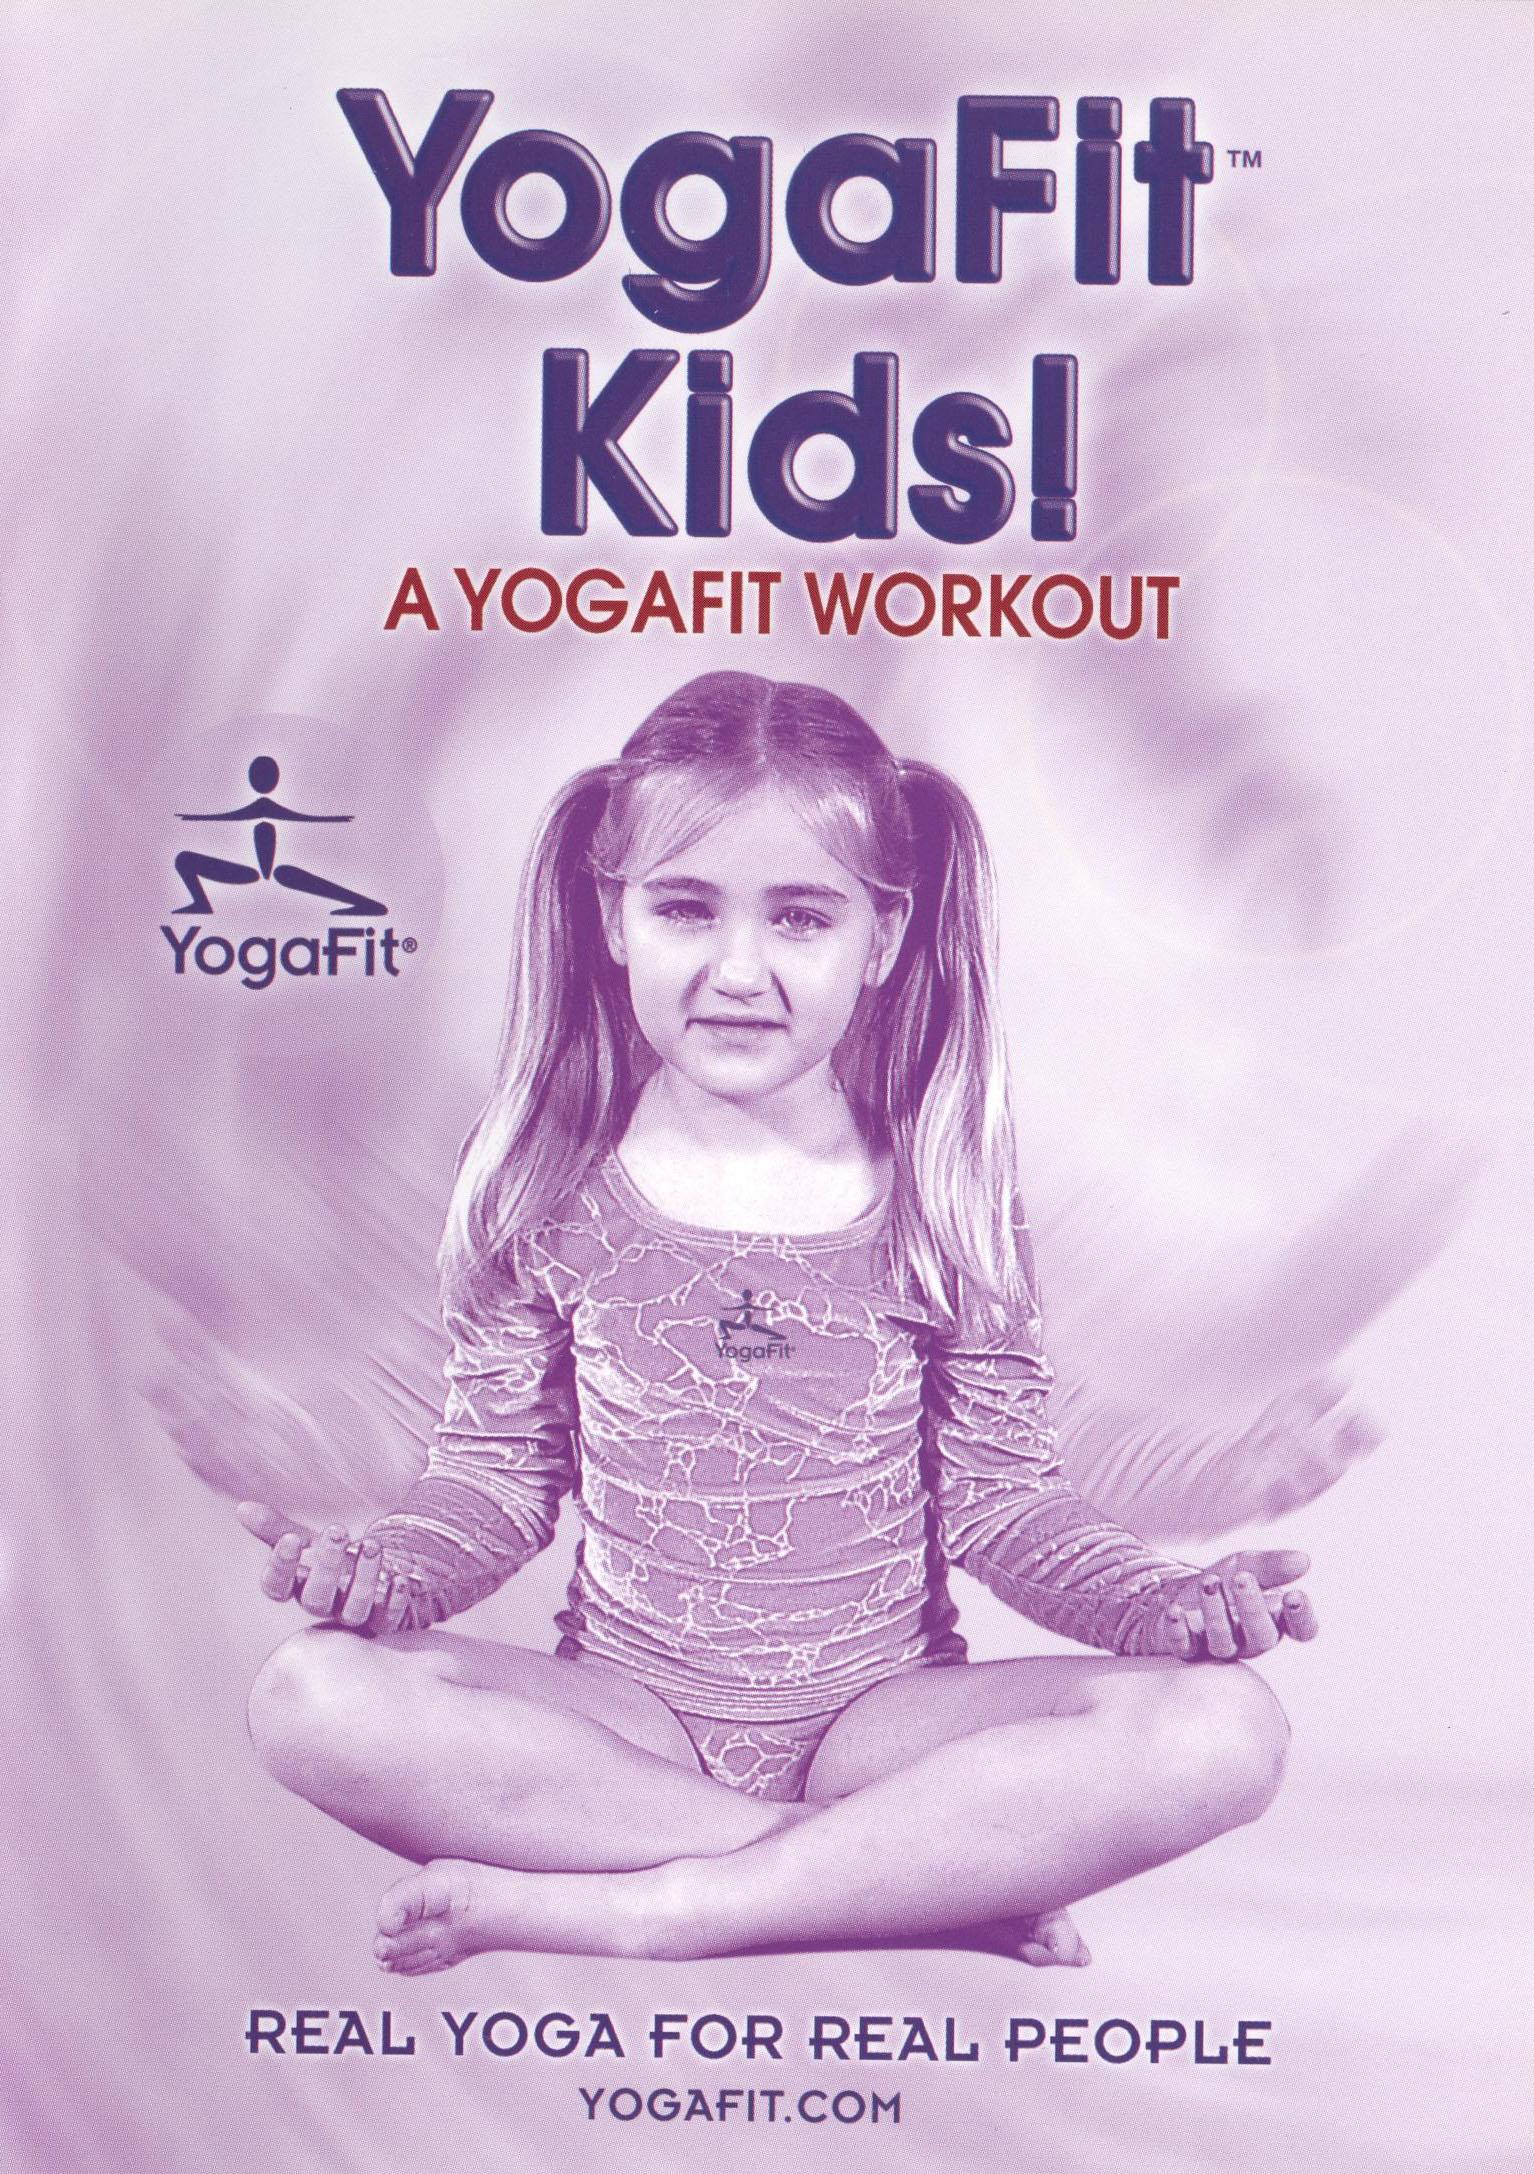 Beth Shaw: YogaFit Kids! A YogaFit Workout